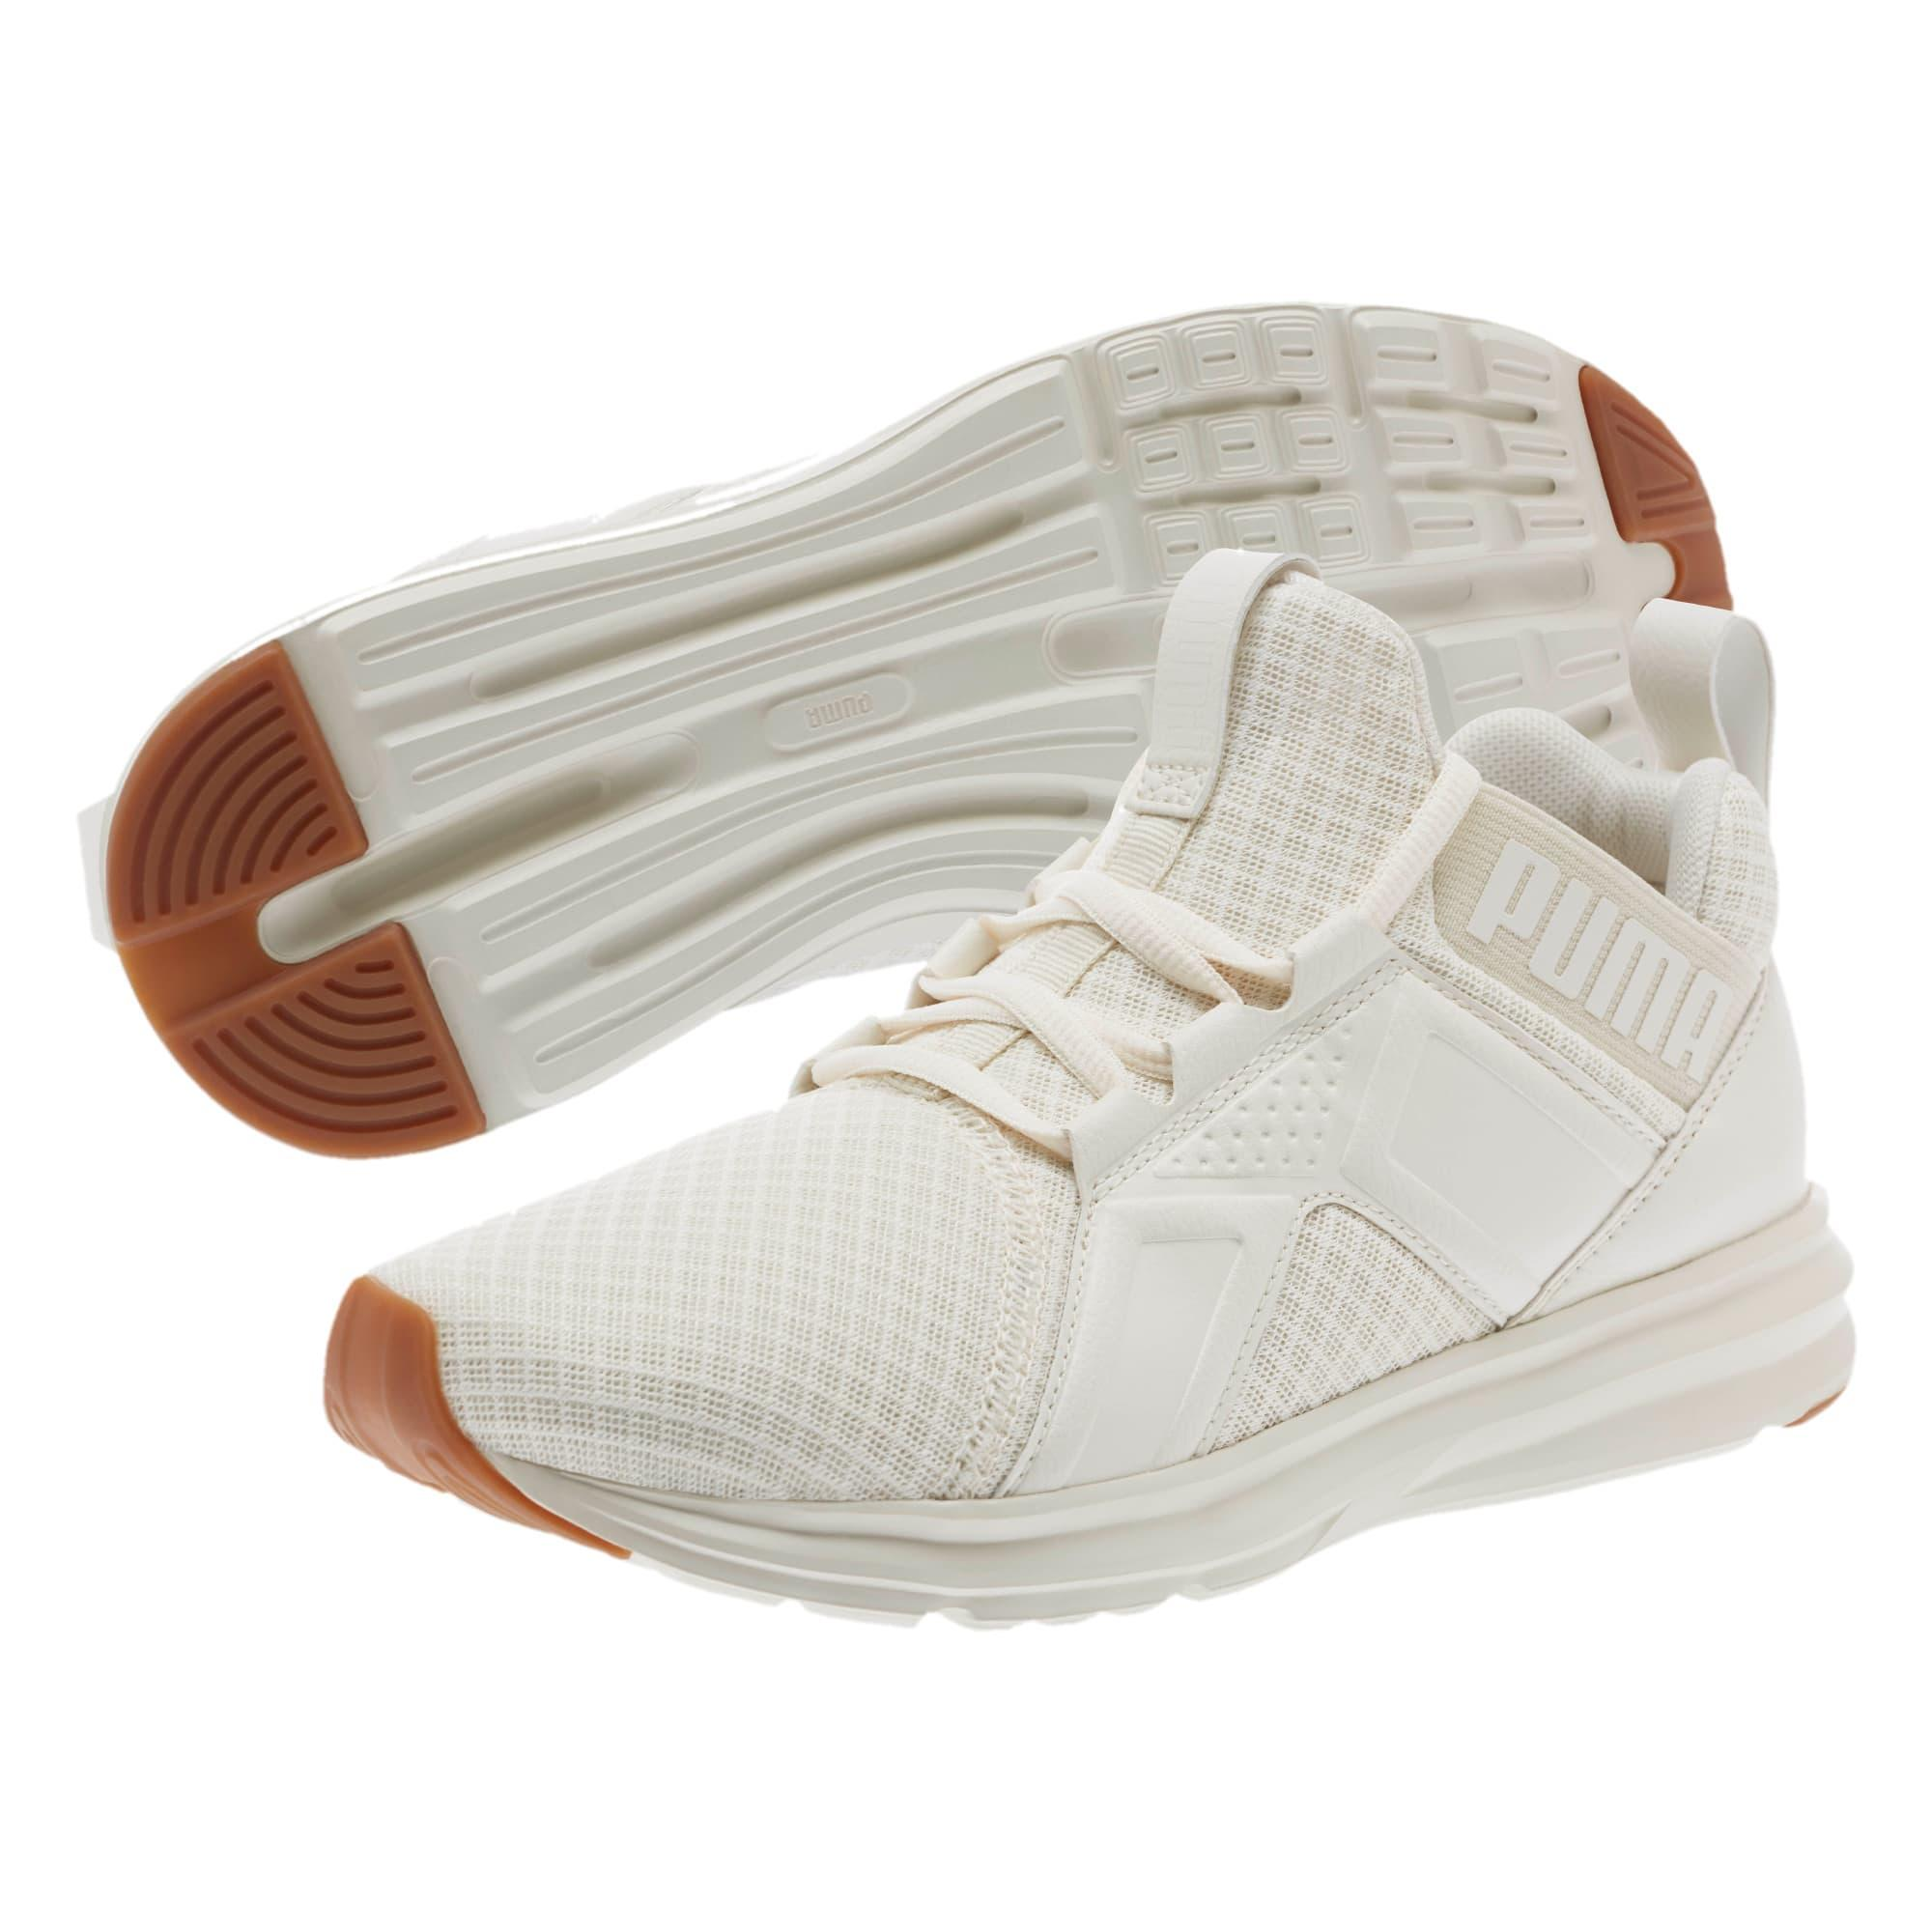 PUMA Enzo Premium Mesh Women's Sneakers